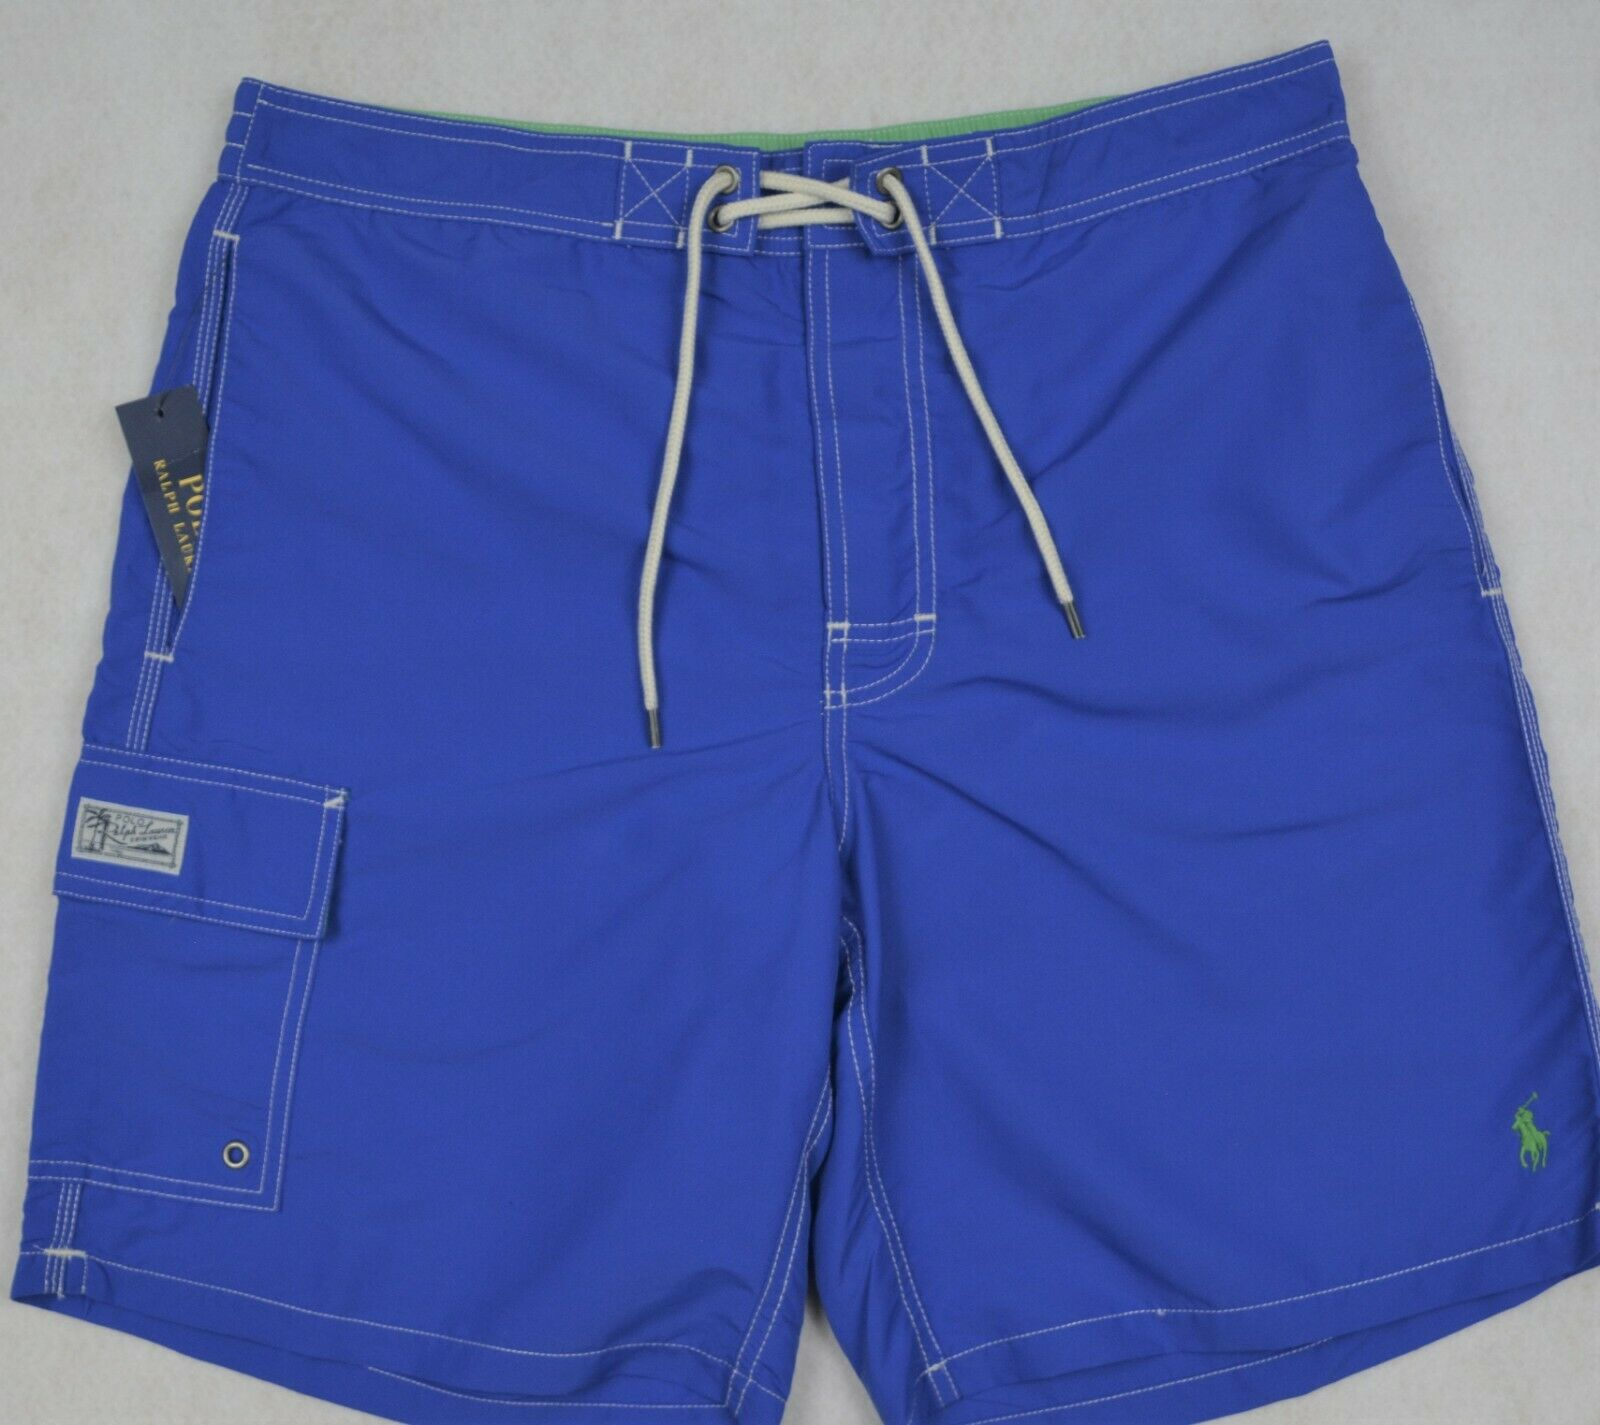 Shorts Polo Ralph Briefs Size Bluee Swim Nwt Medium Lauren Trunks M 7yfYvb6g